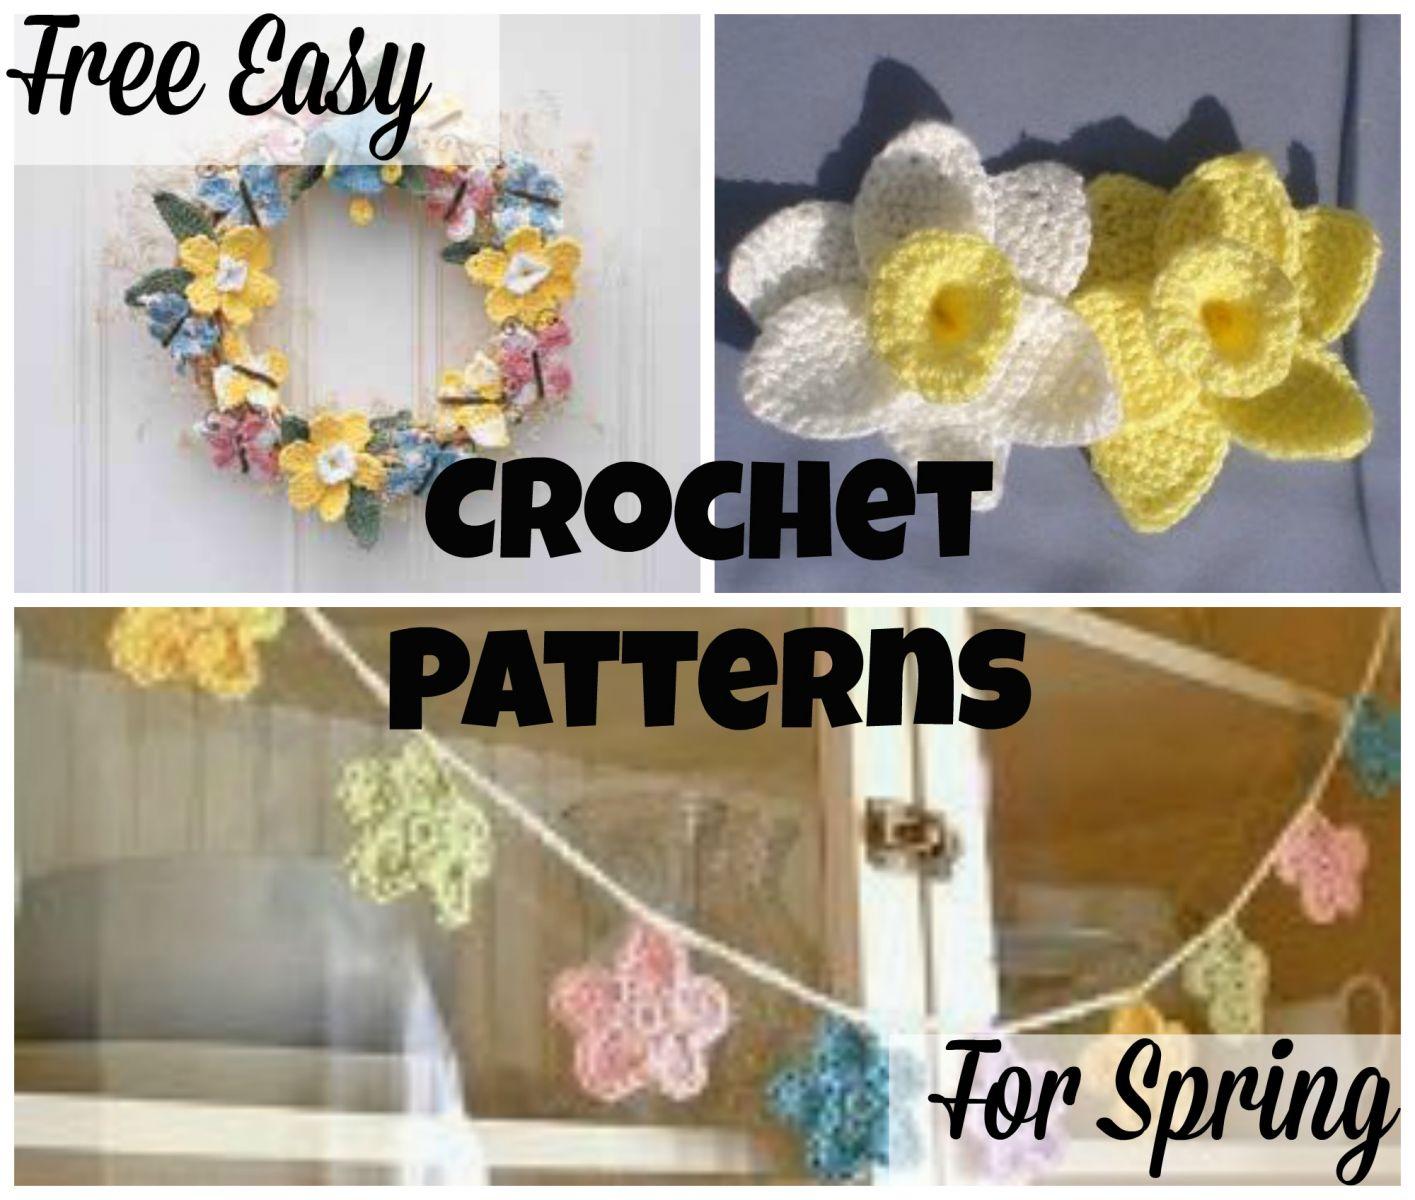 15 Free Easy Crochet Patterns for Spring | AllFreeCrochet.com